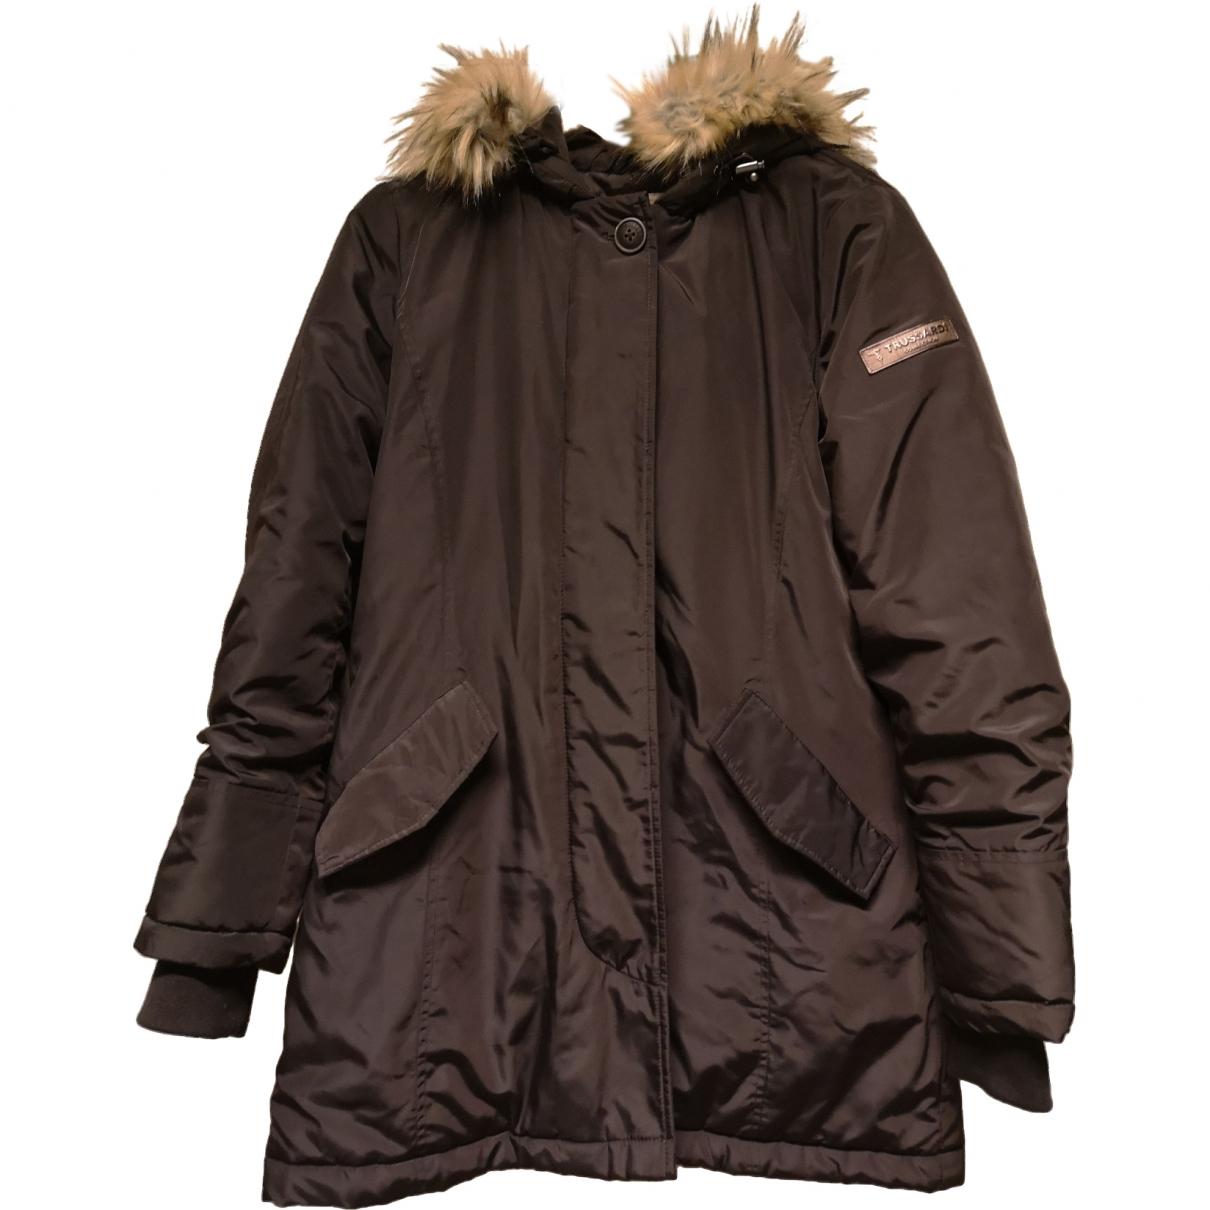 Trussardi \N Brown coat for Women 42 FR